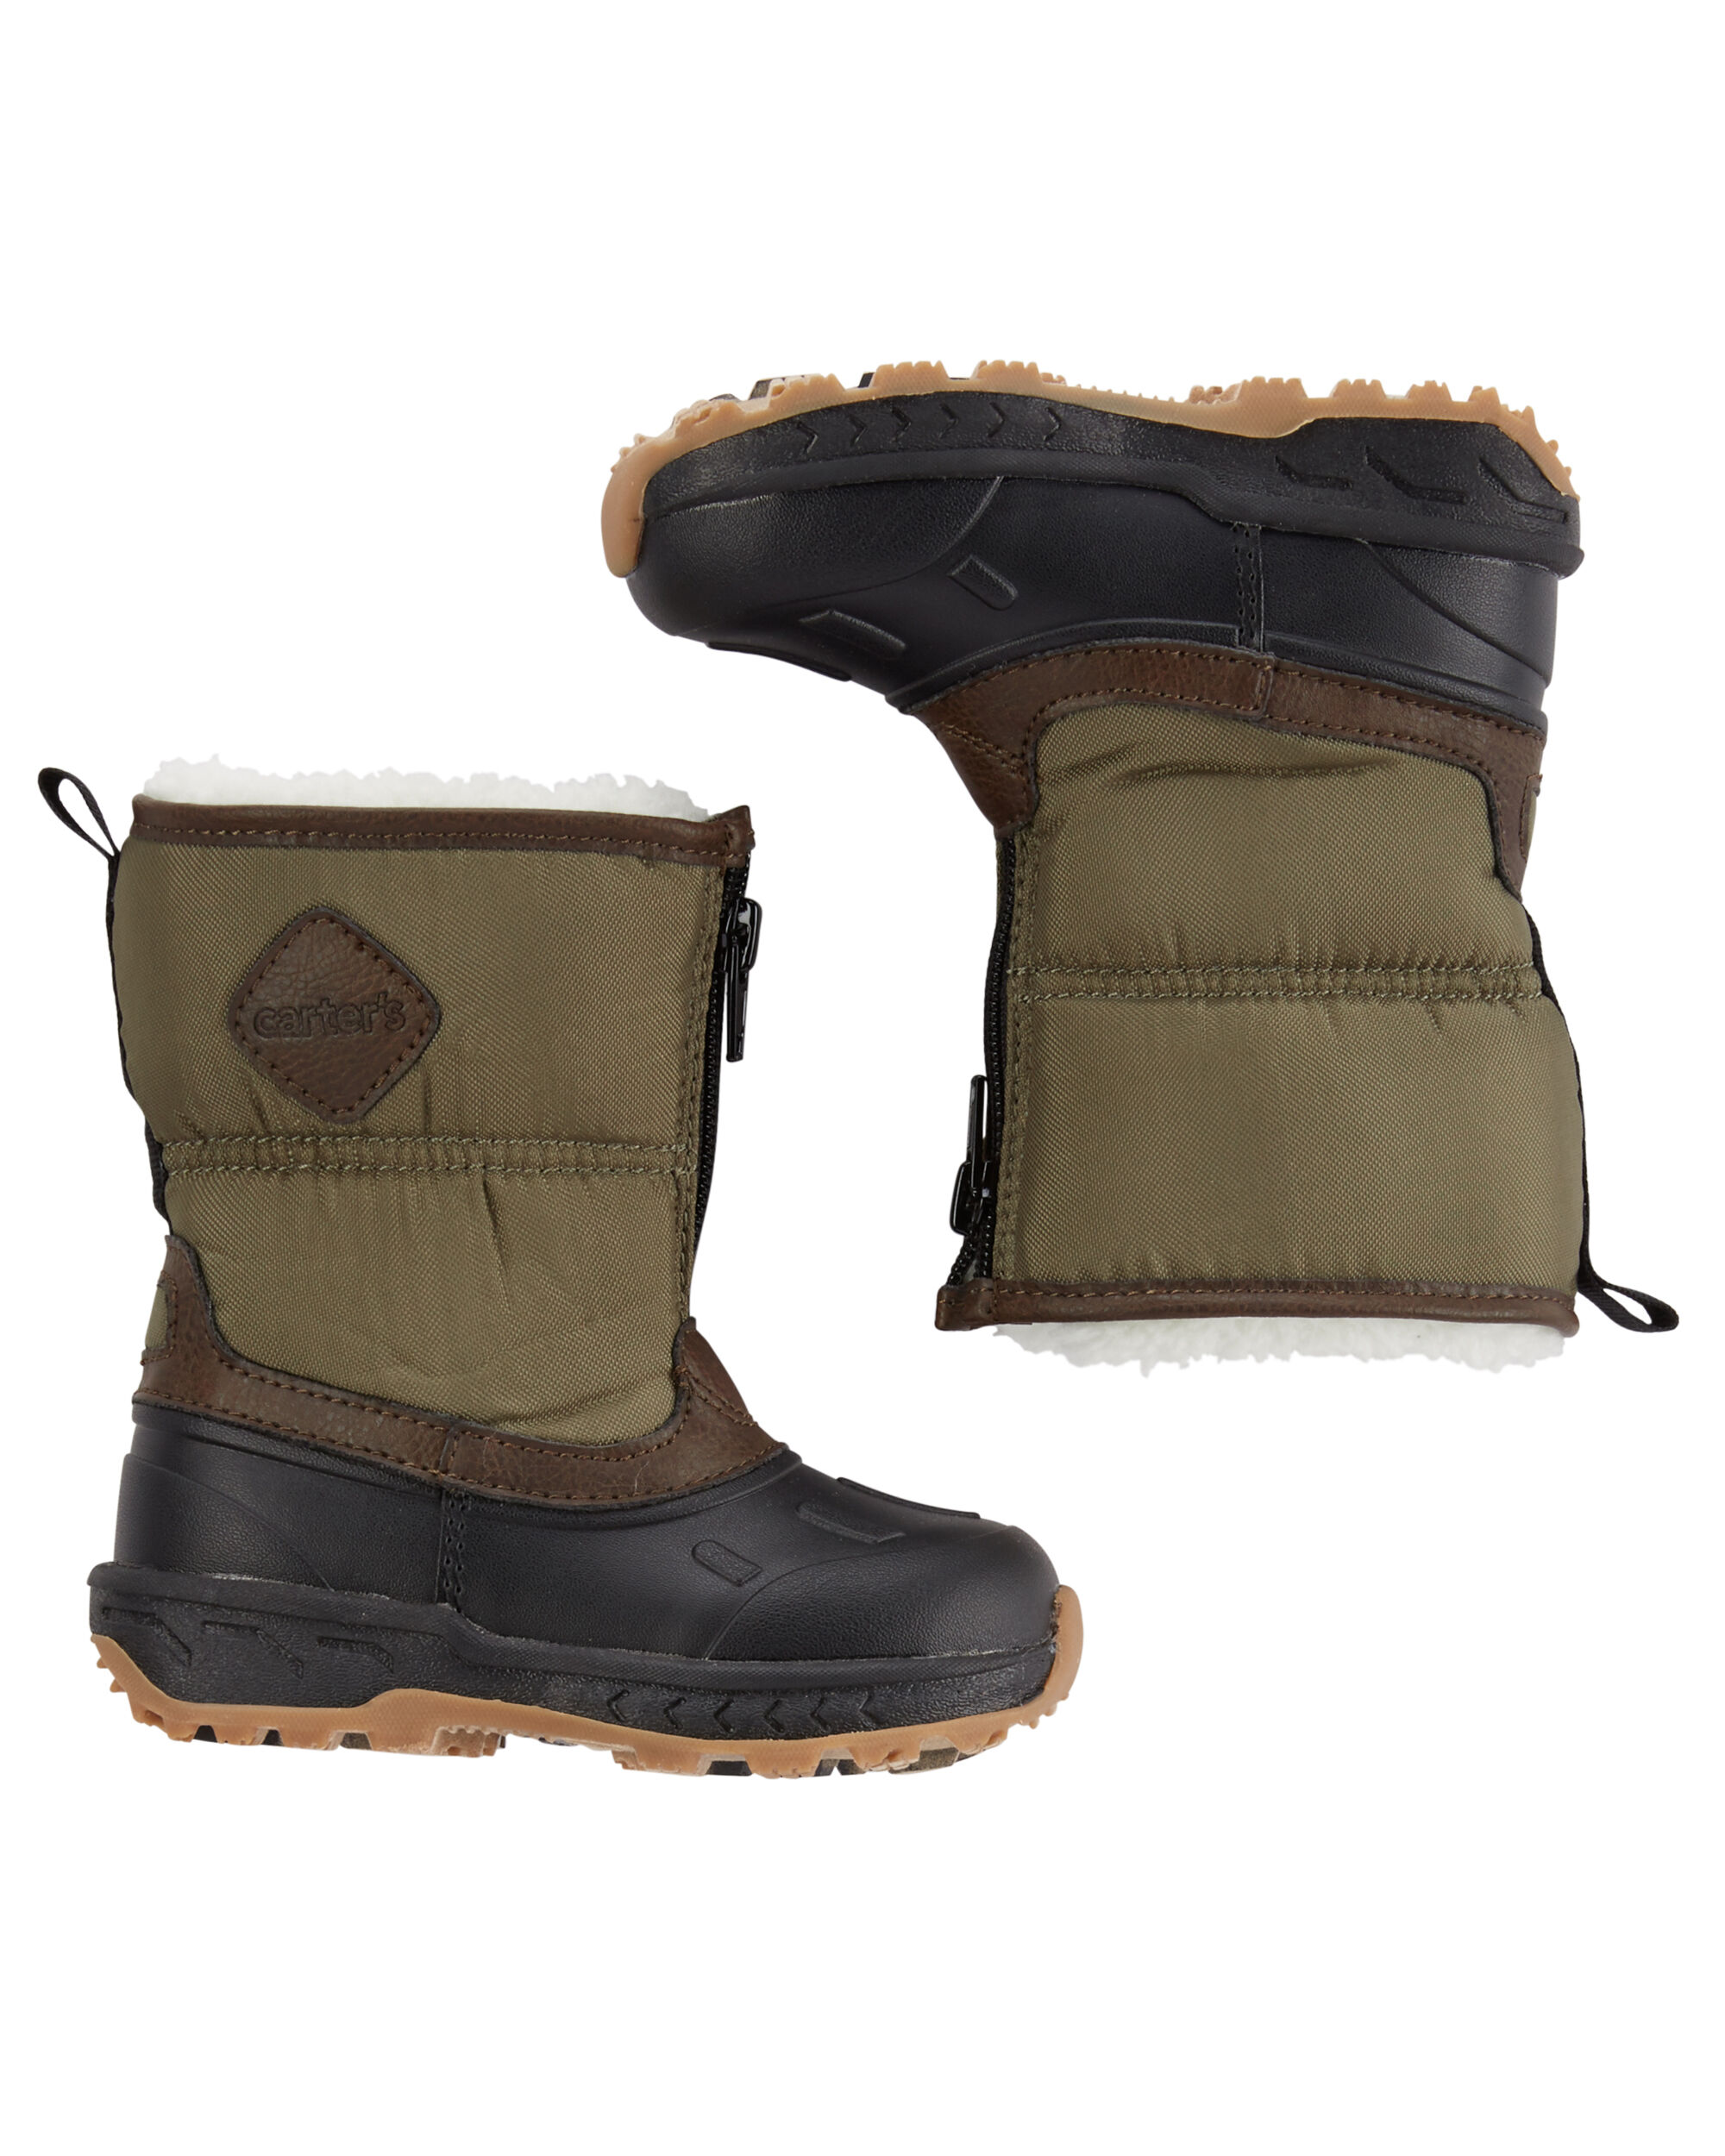 Carter's Snow Boots | Carters.com